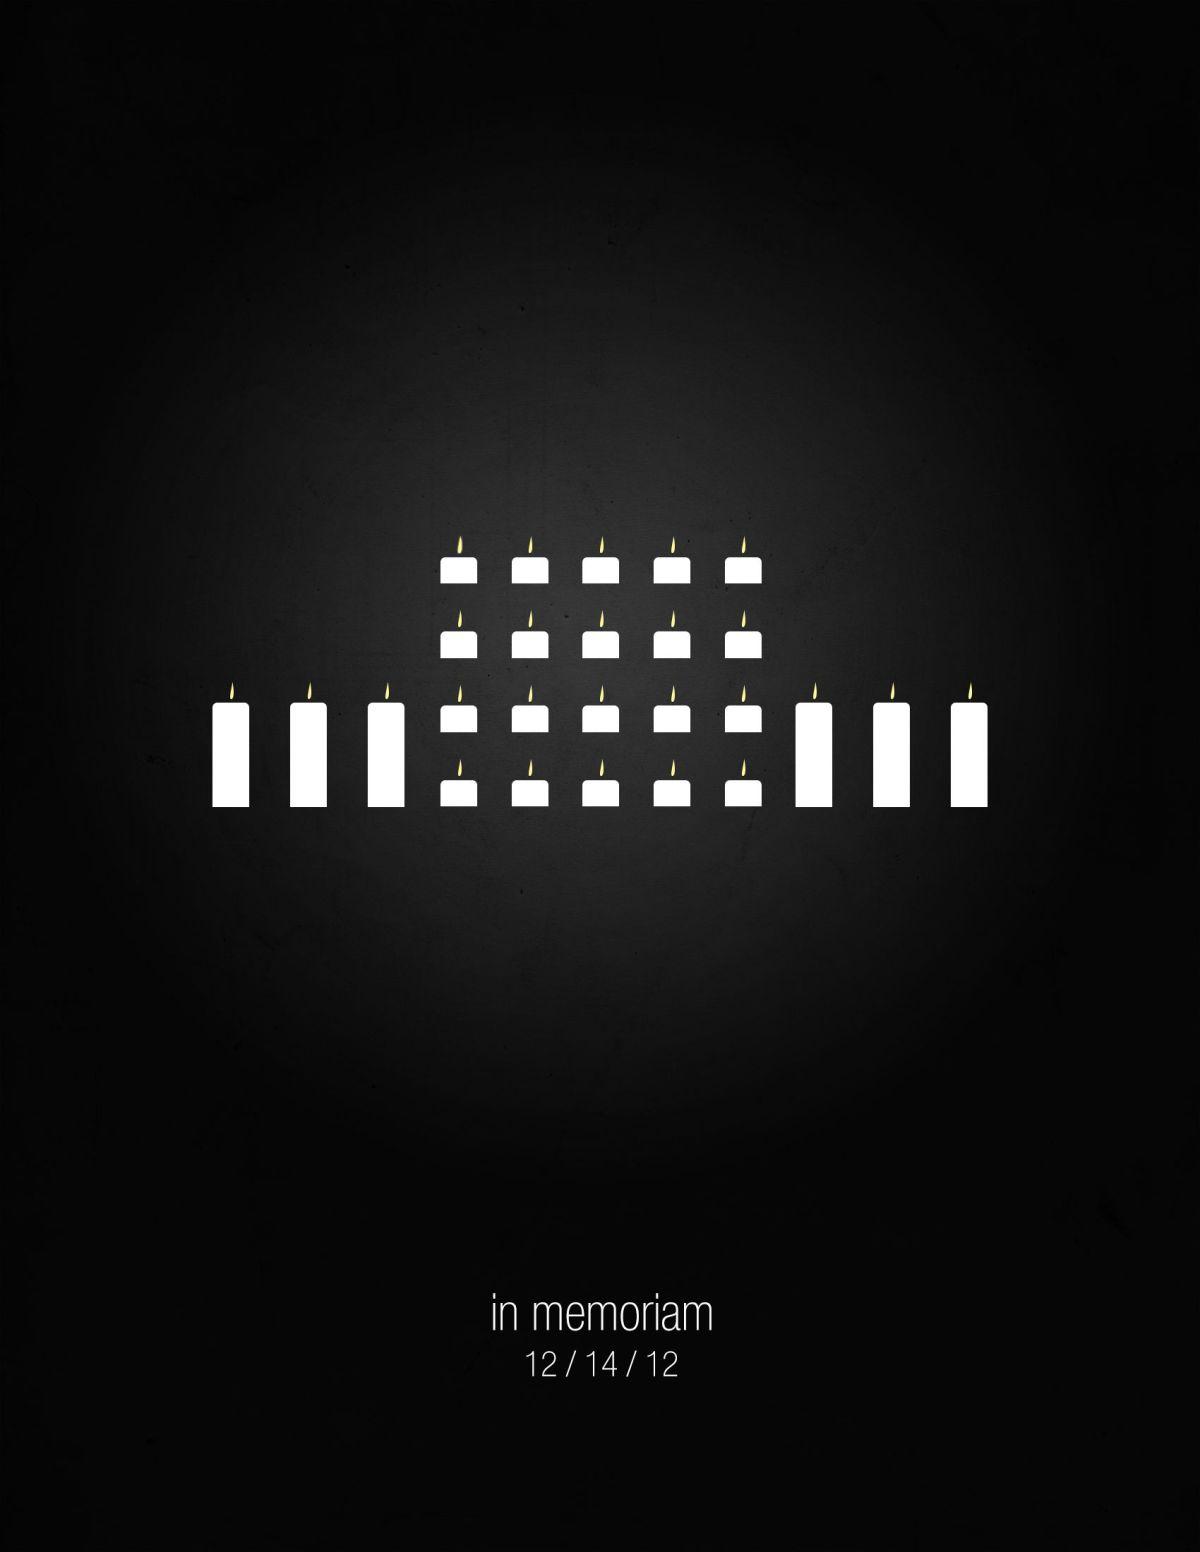 newton - in memorian